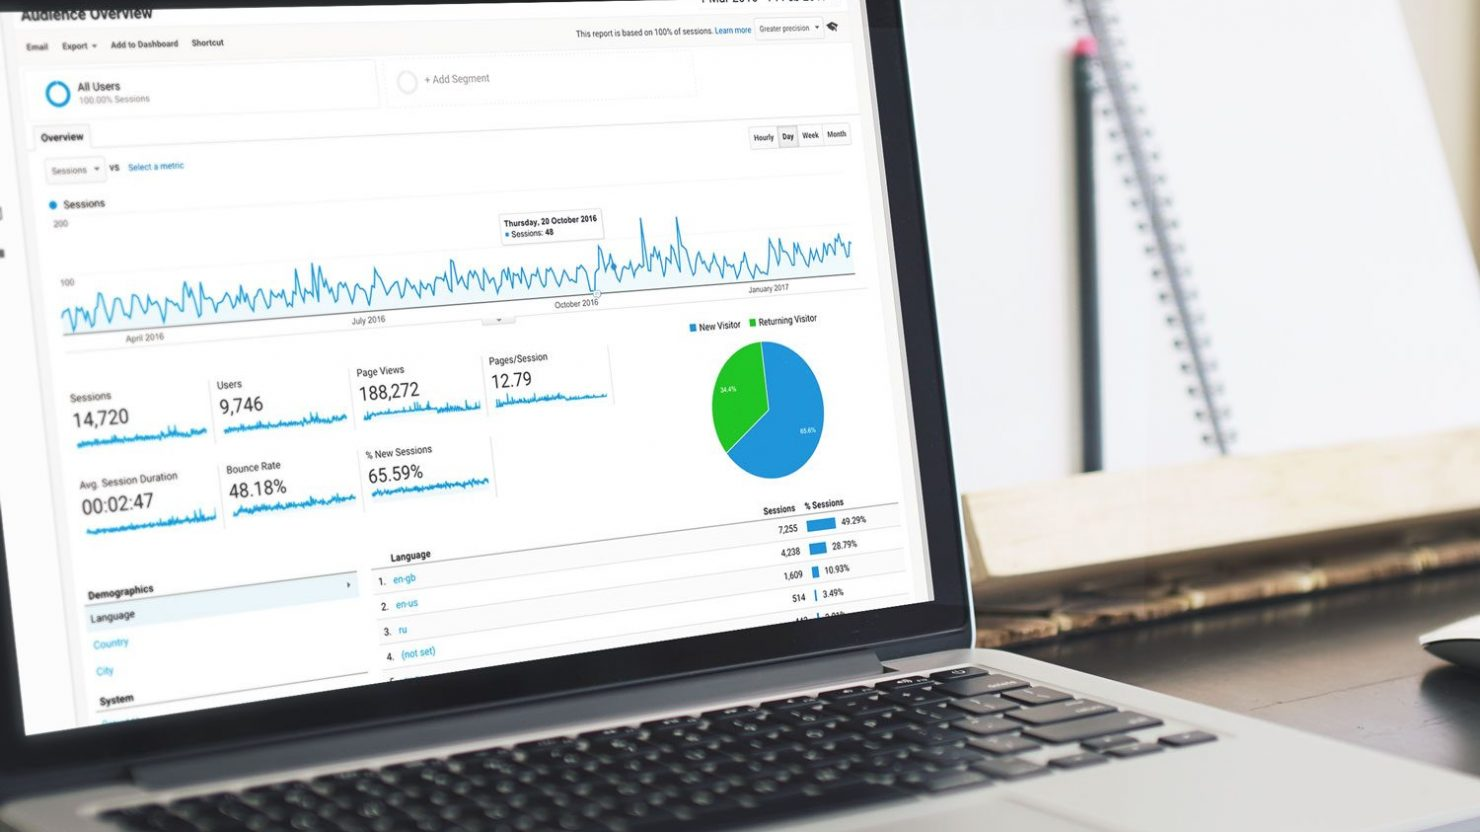 Apple iMac with Google Analytics data